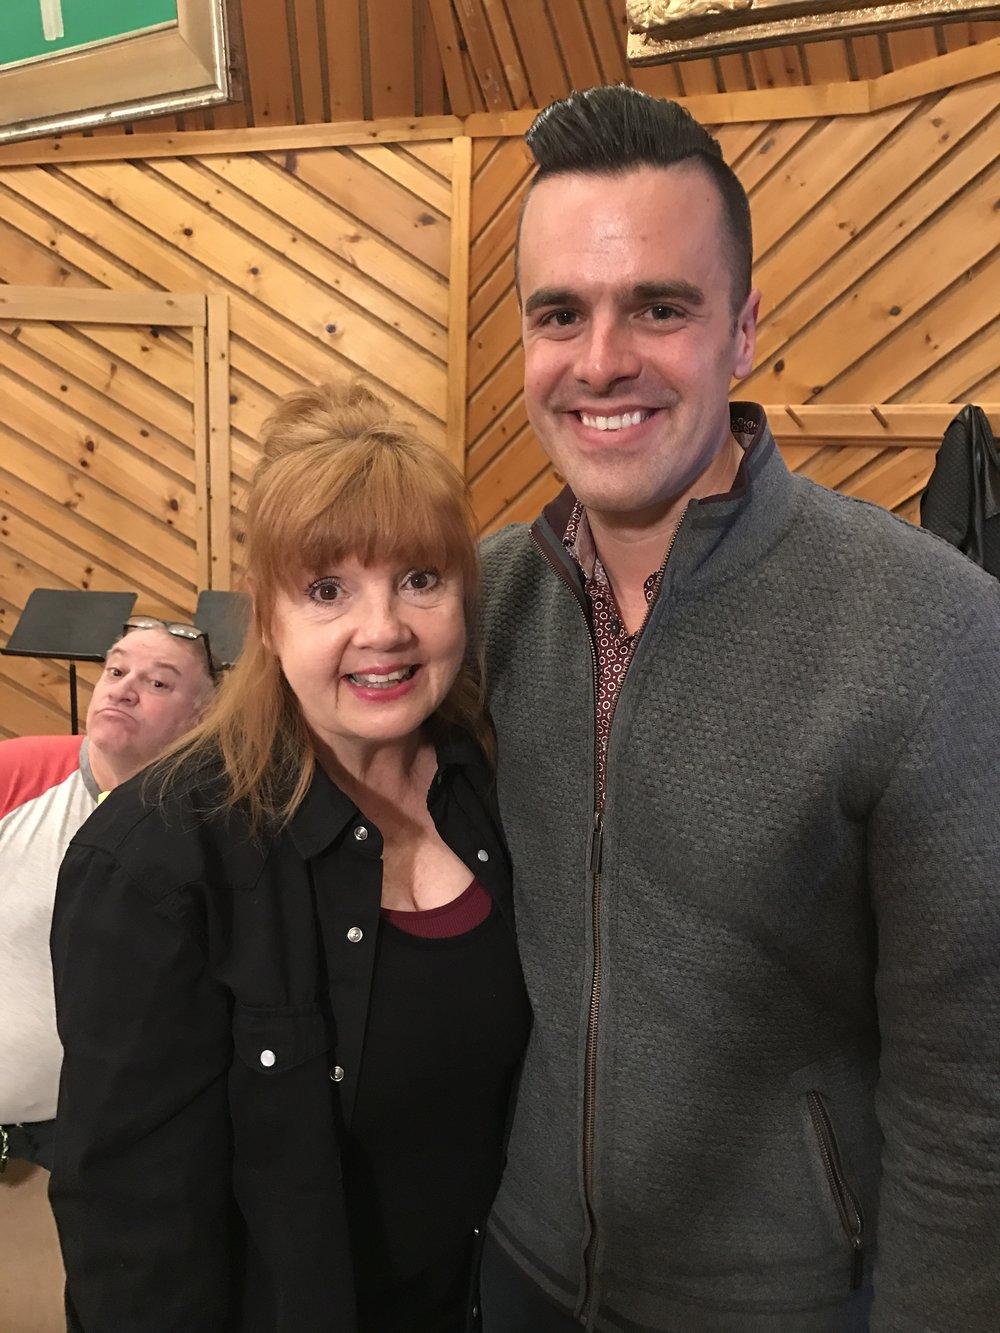 Michael J Moritz Jr and Annie Golden